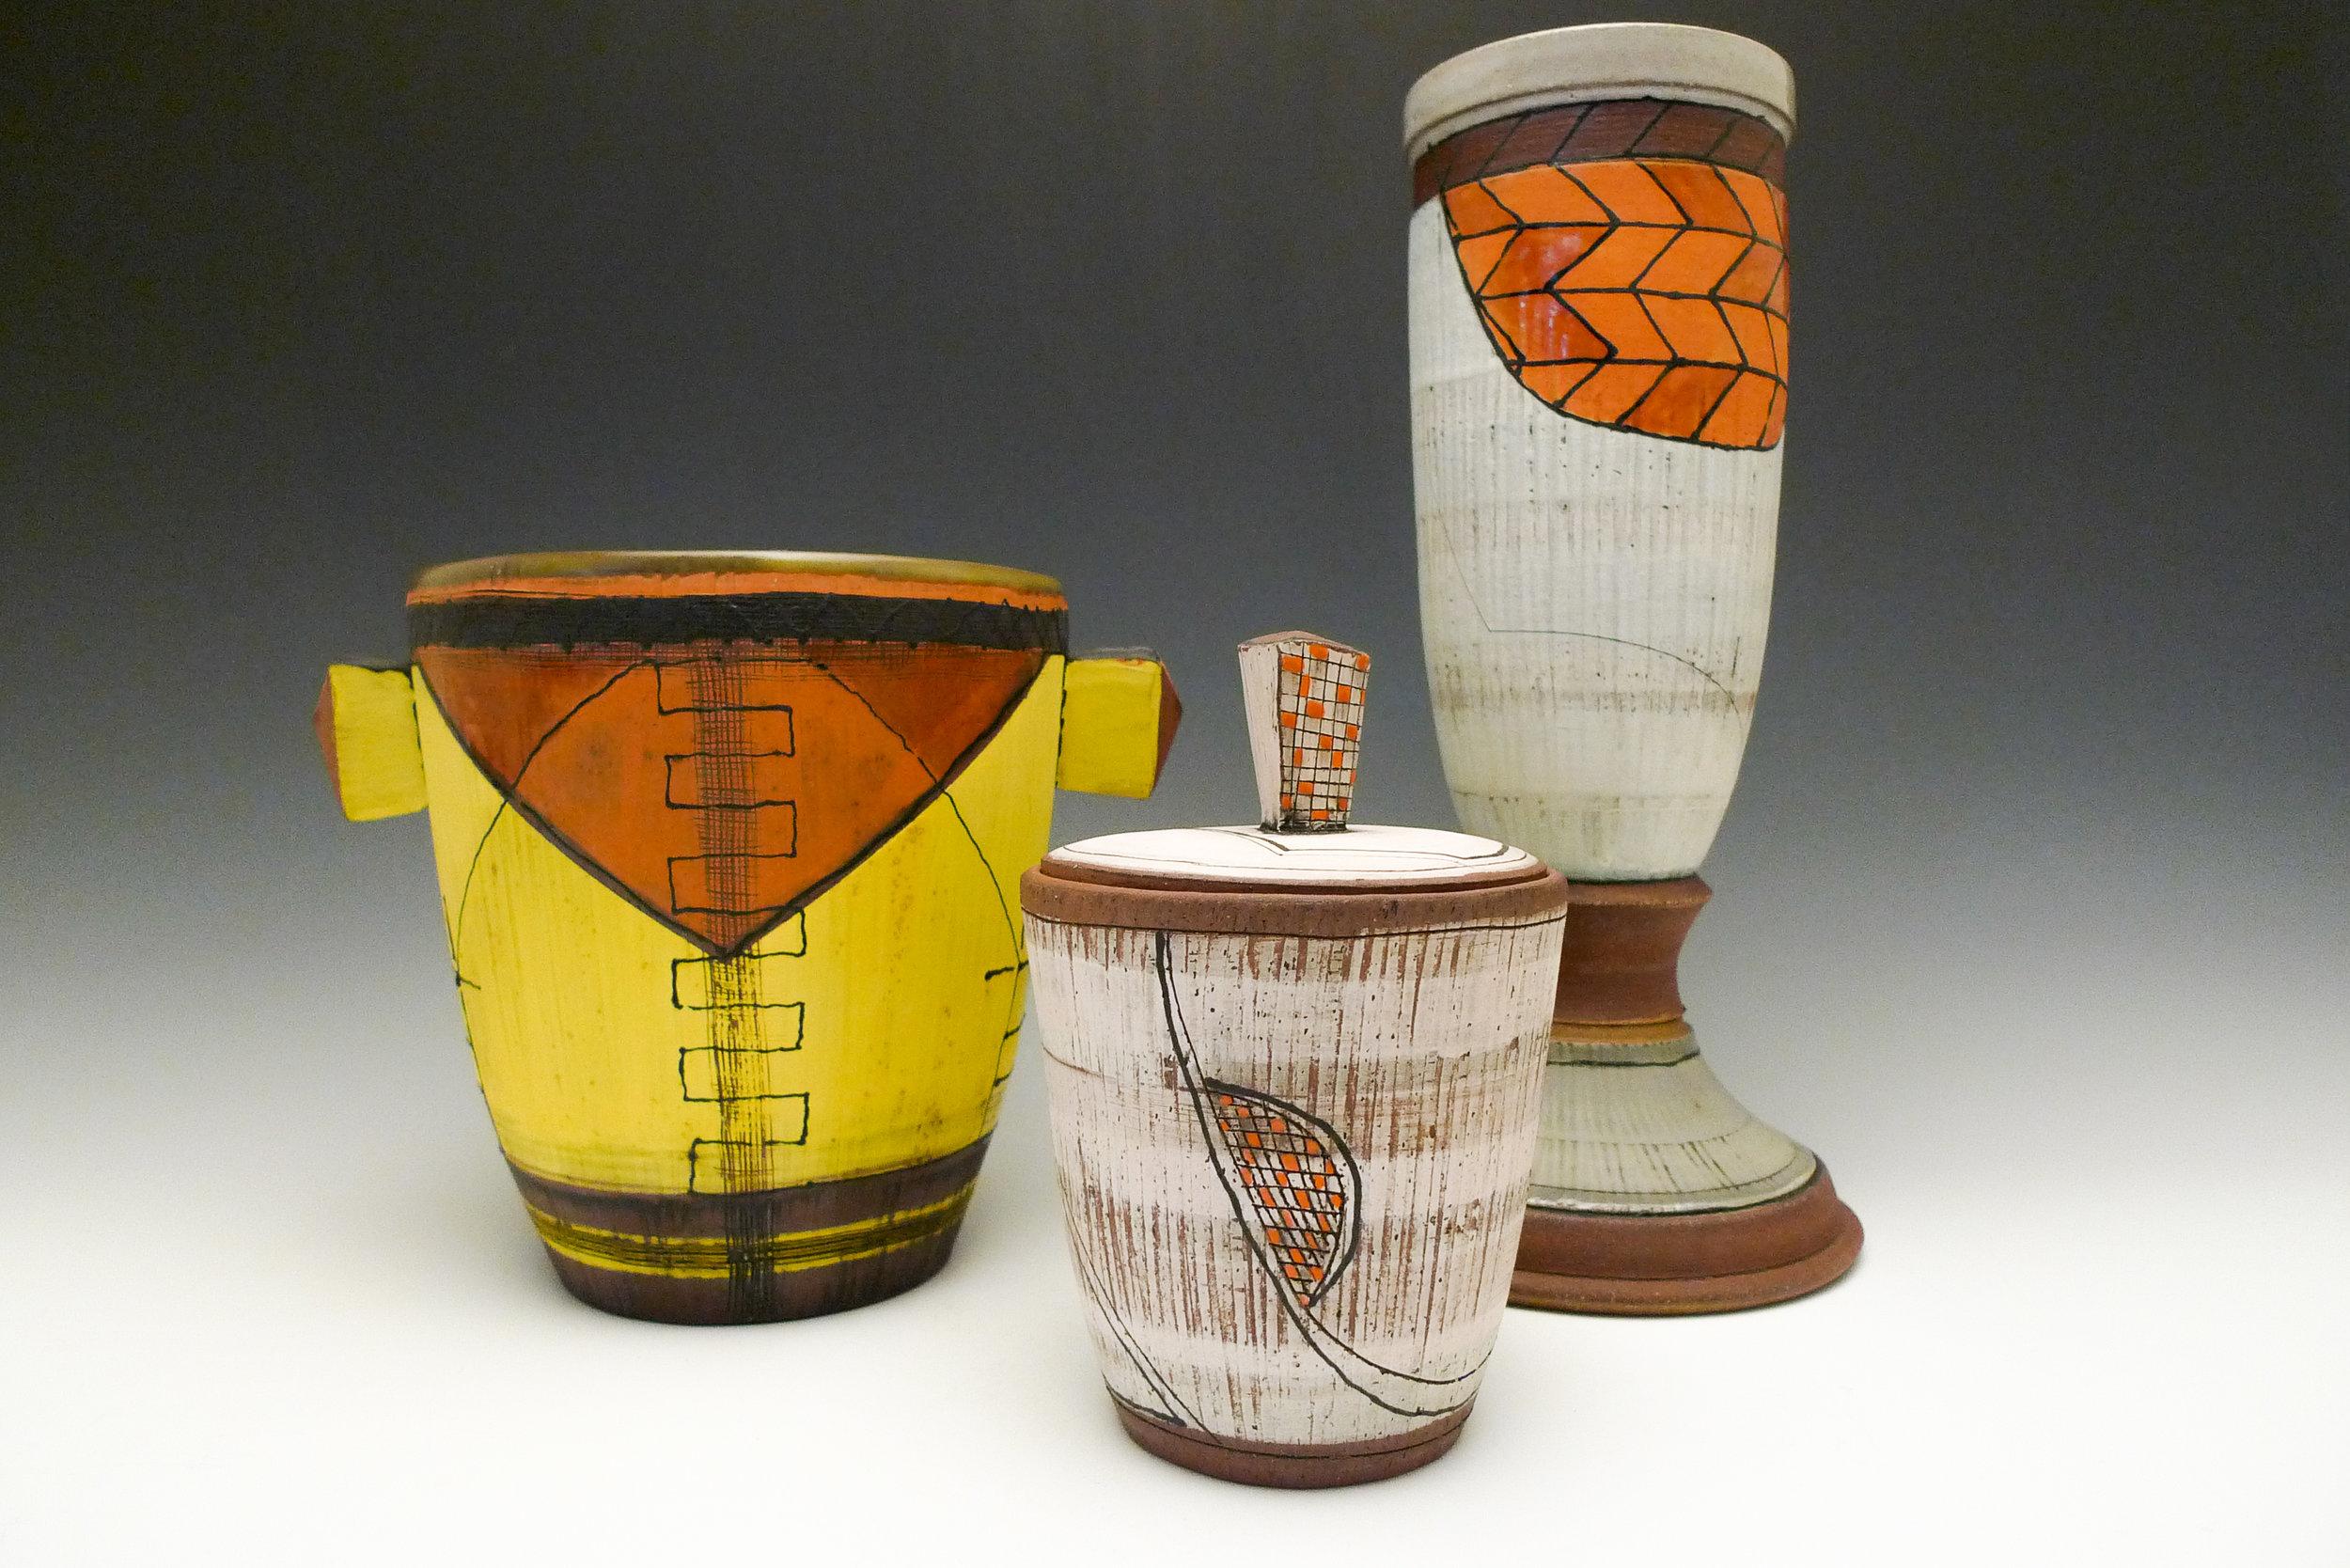 Vessels ceramic